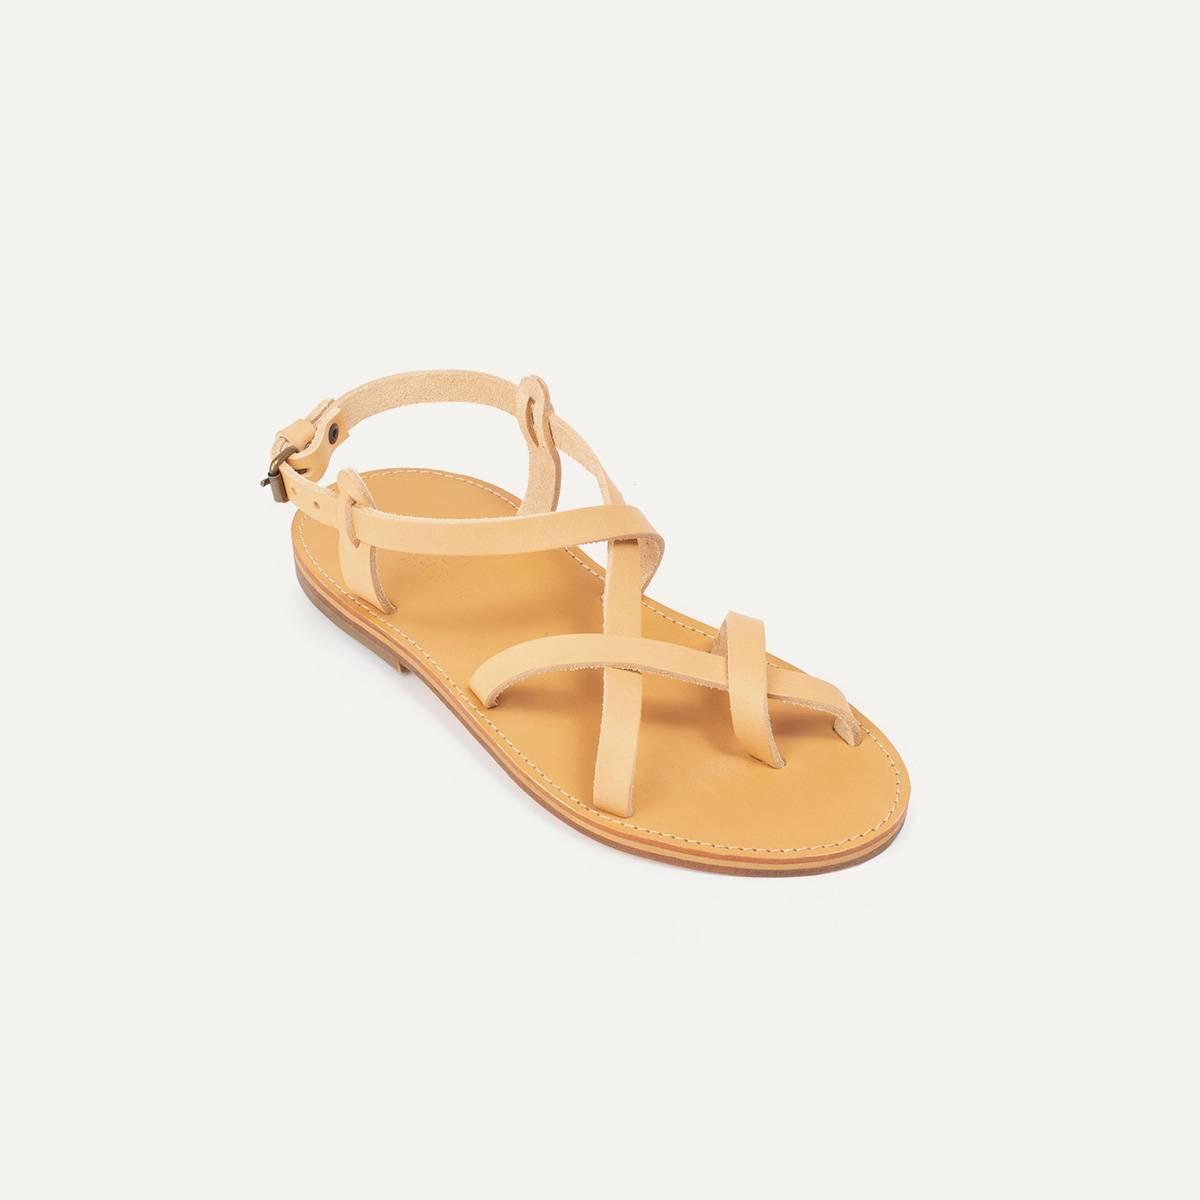 Nara leather sandals - Natural (image n°2)